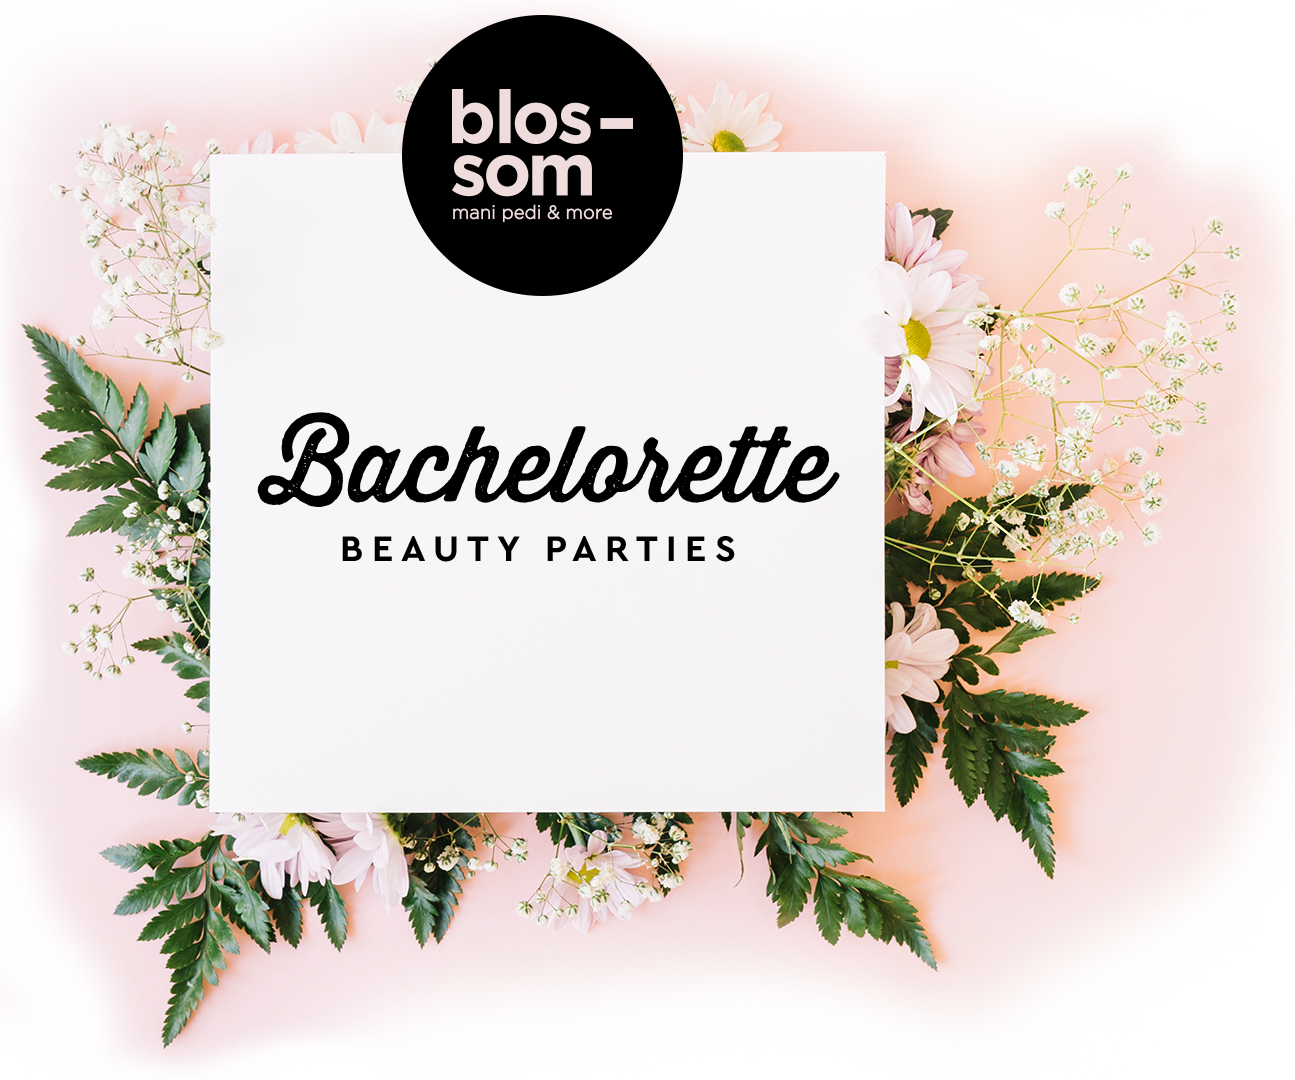 Blossom Bachelorette